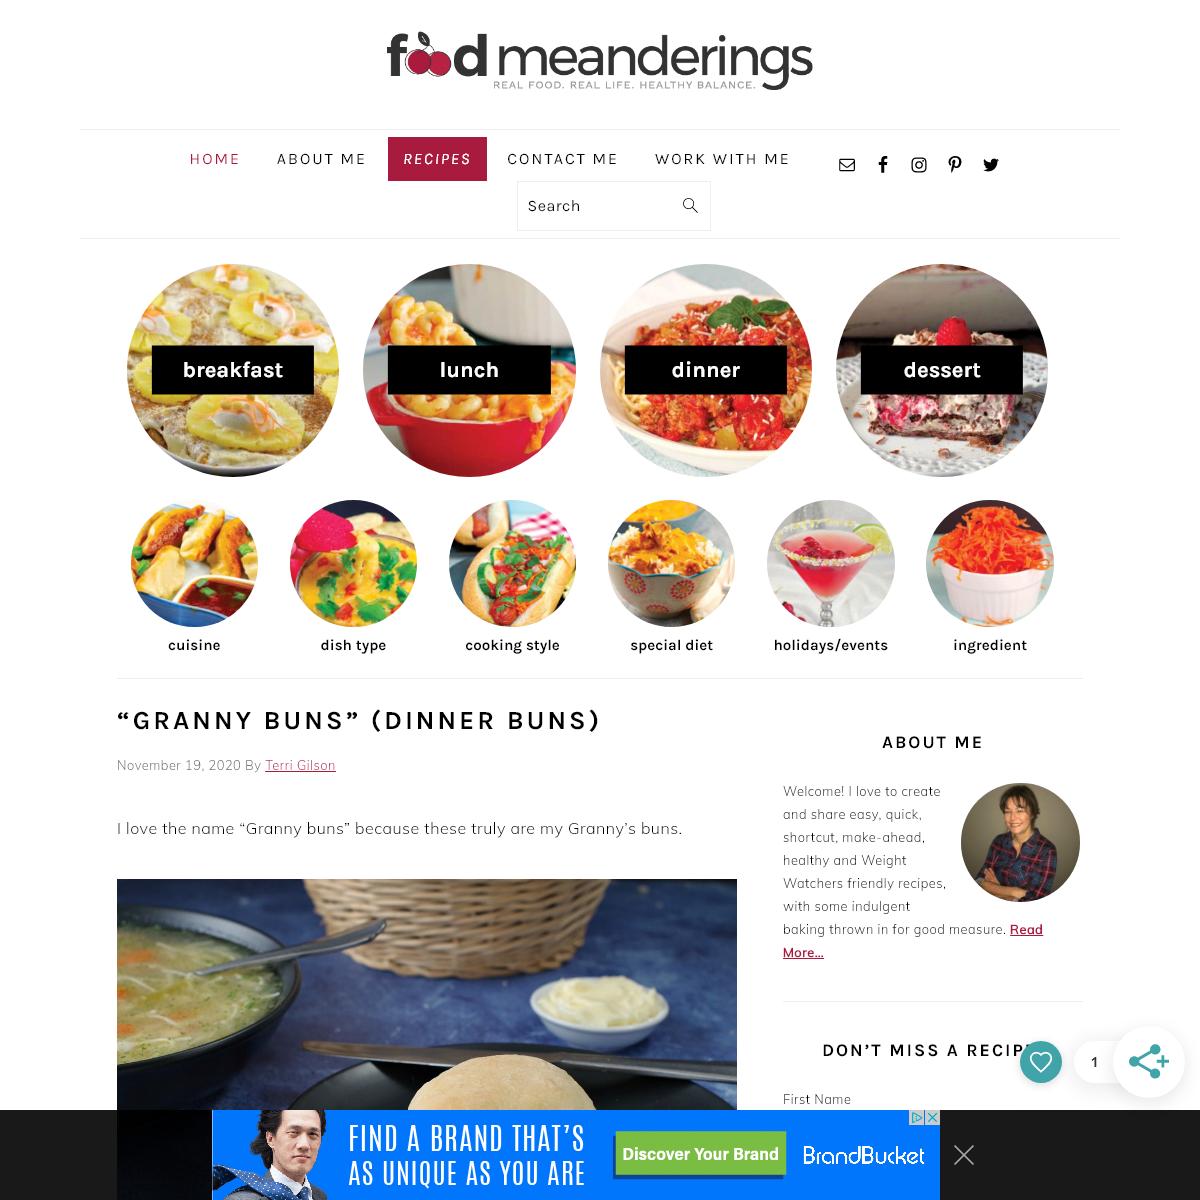 Food Meanderings - Real Food. Real Life. Healthy Balance.